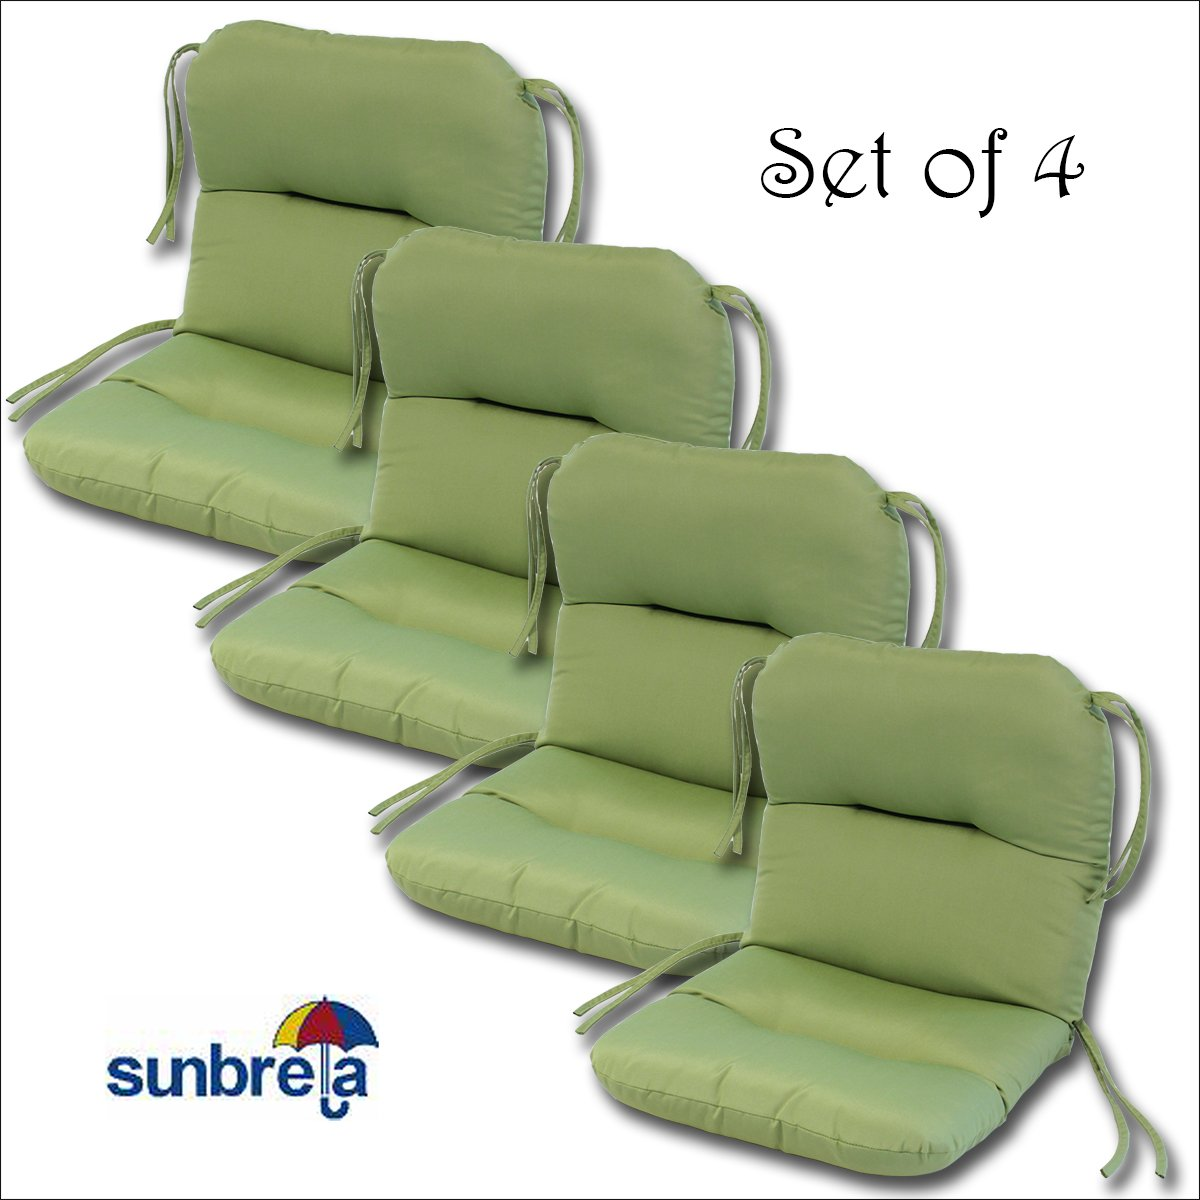 amazoncom set of 4 outdoor chair cushions 20 x 36 x 3 h19 in sunbrella fabric peridot by comfort classics inc patio lawn u0026 garden